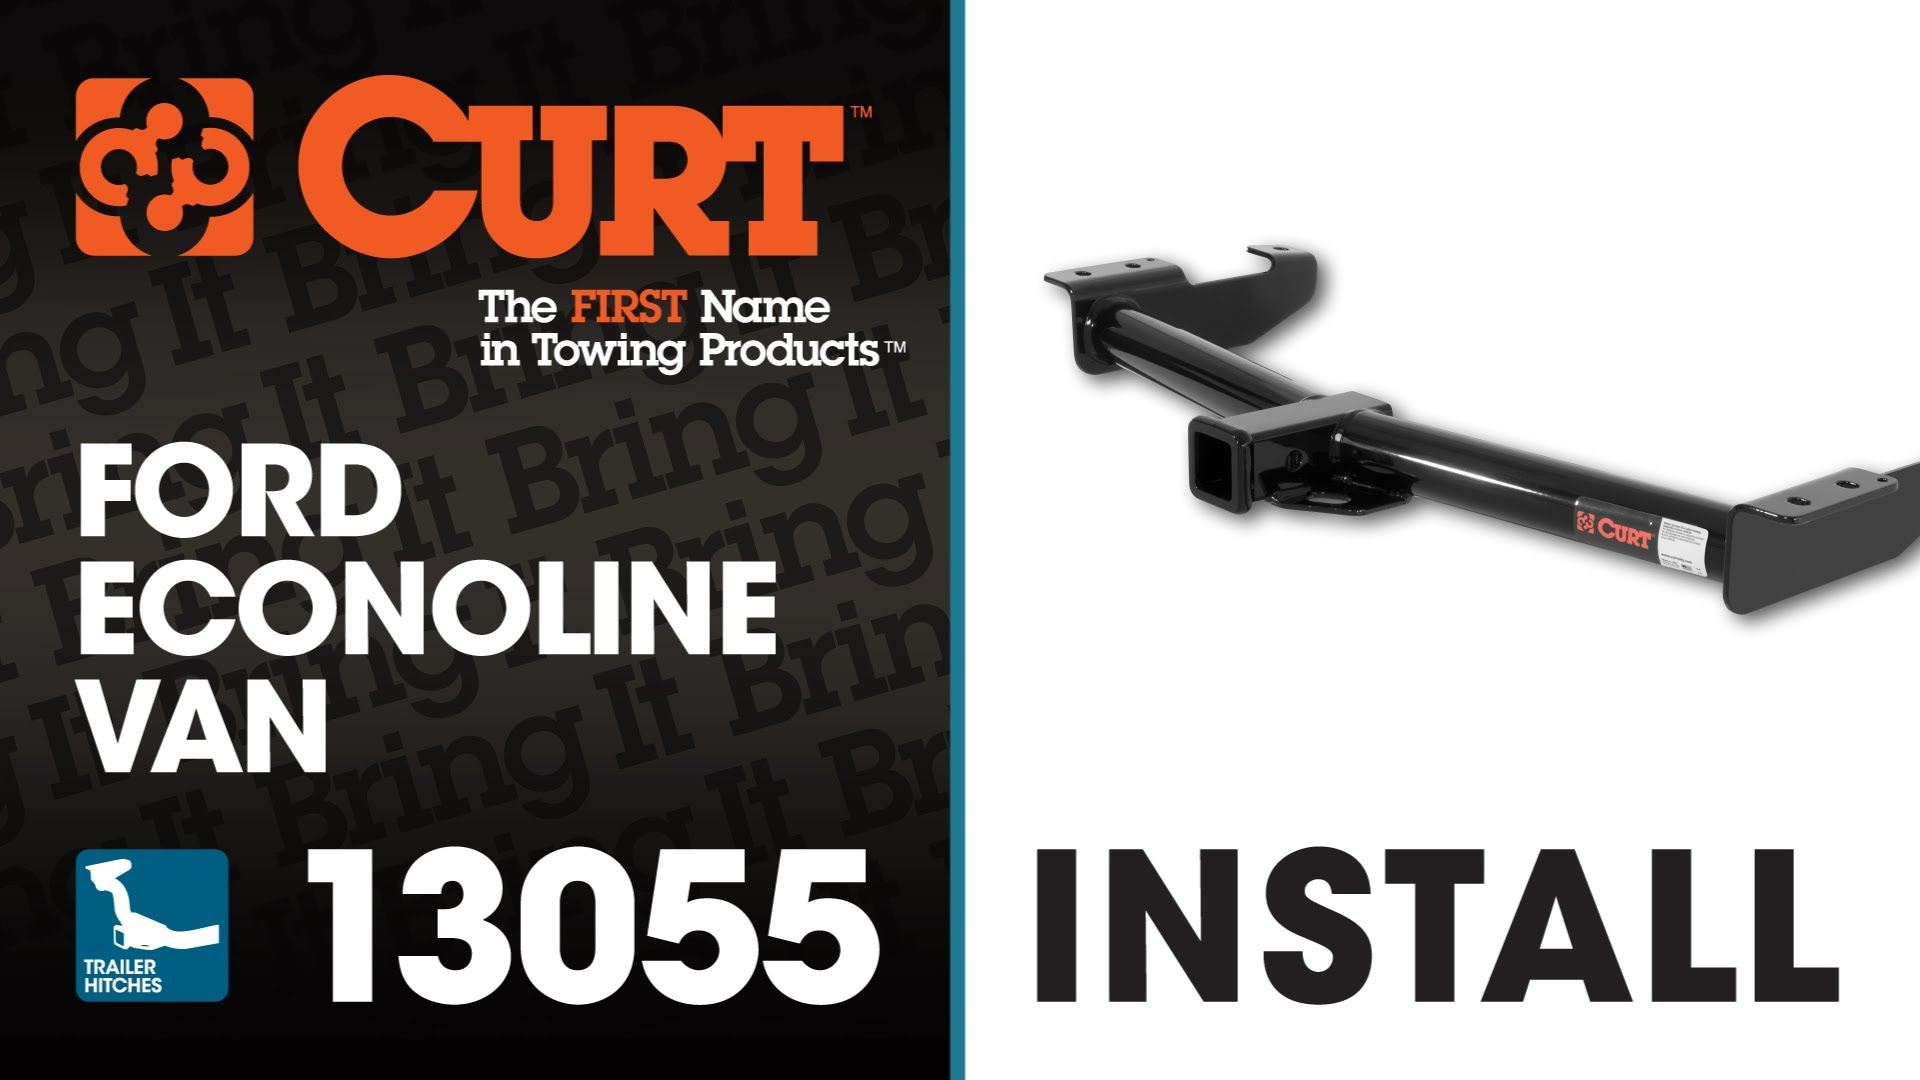 Trailer Hitch Install: CURT 13055 on Ford Econoline Van